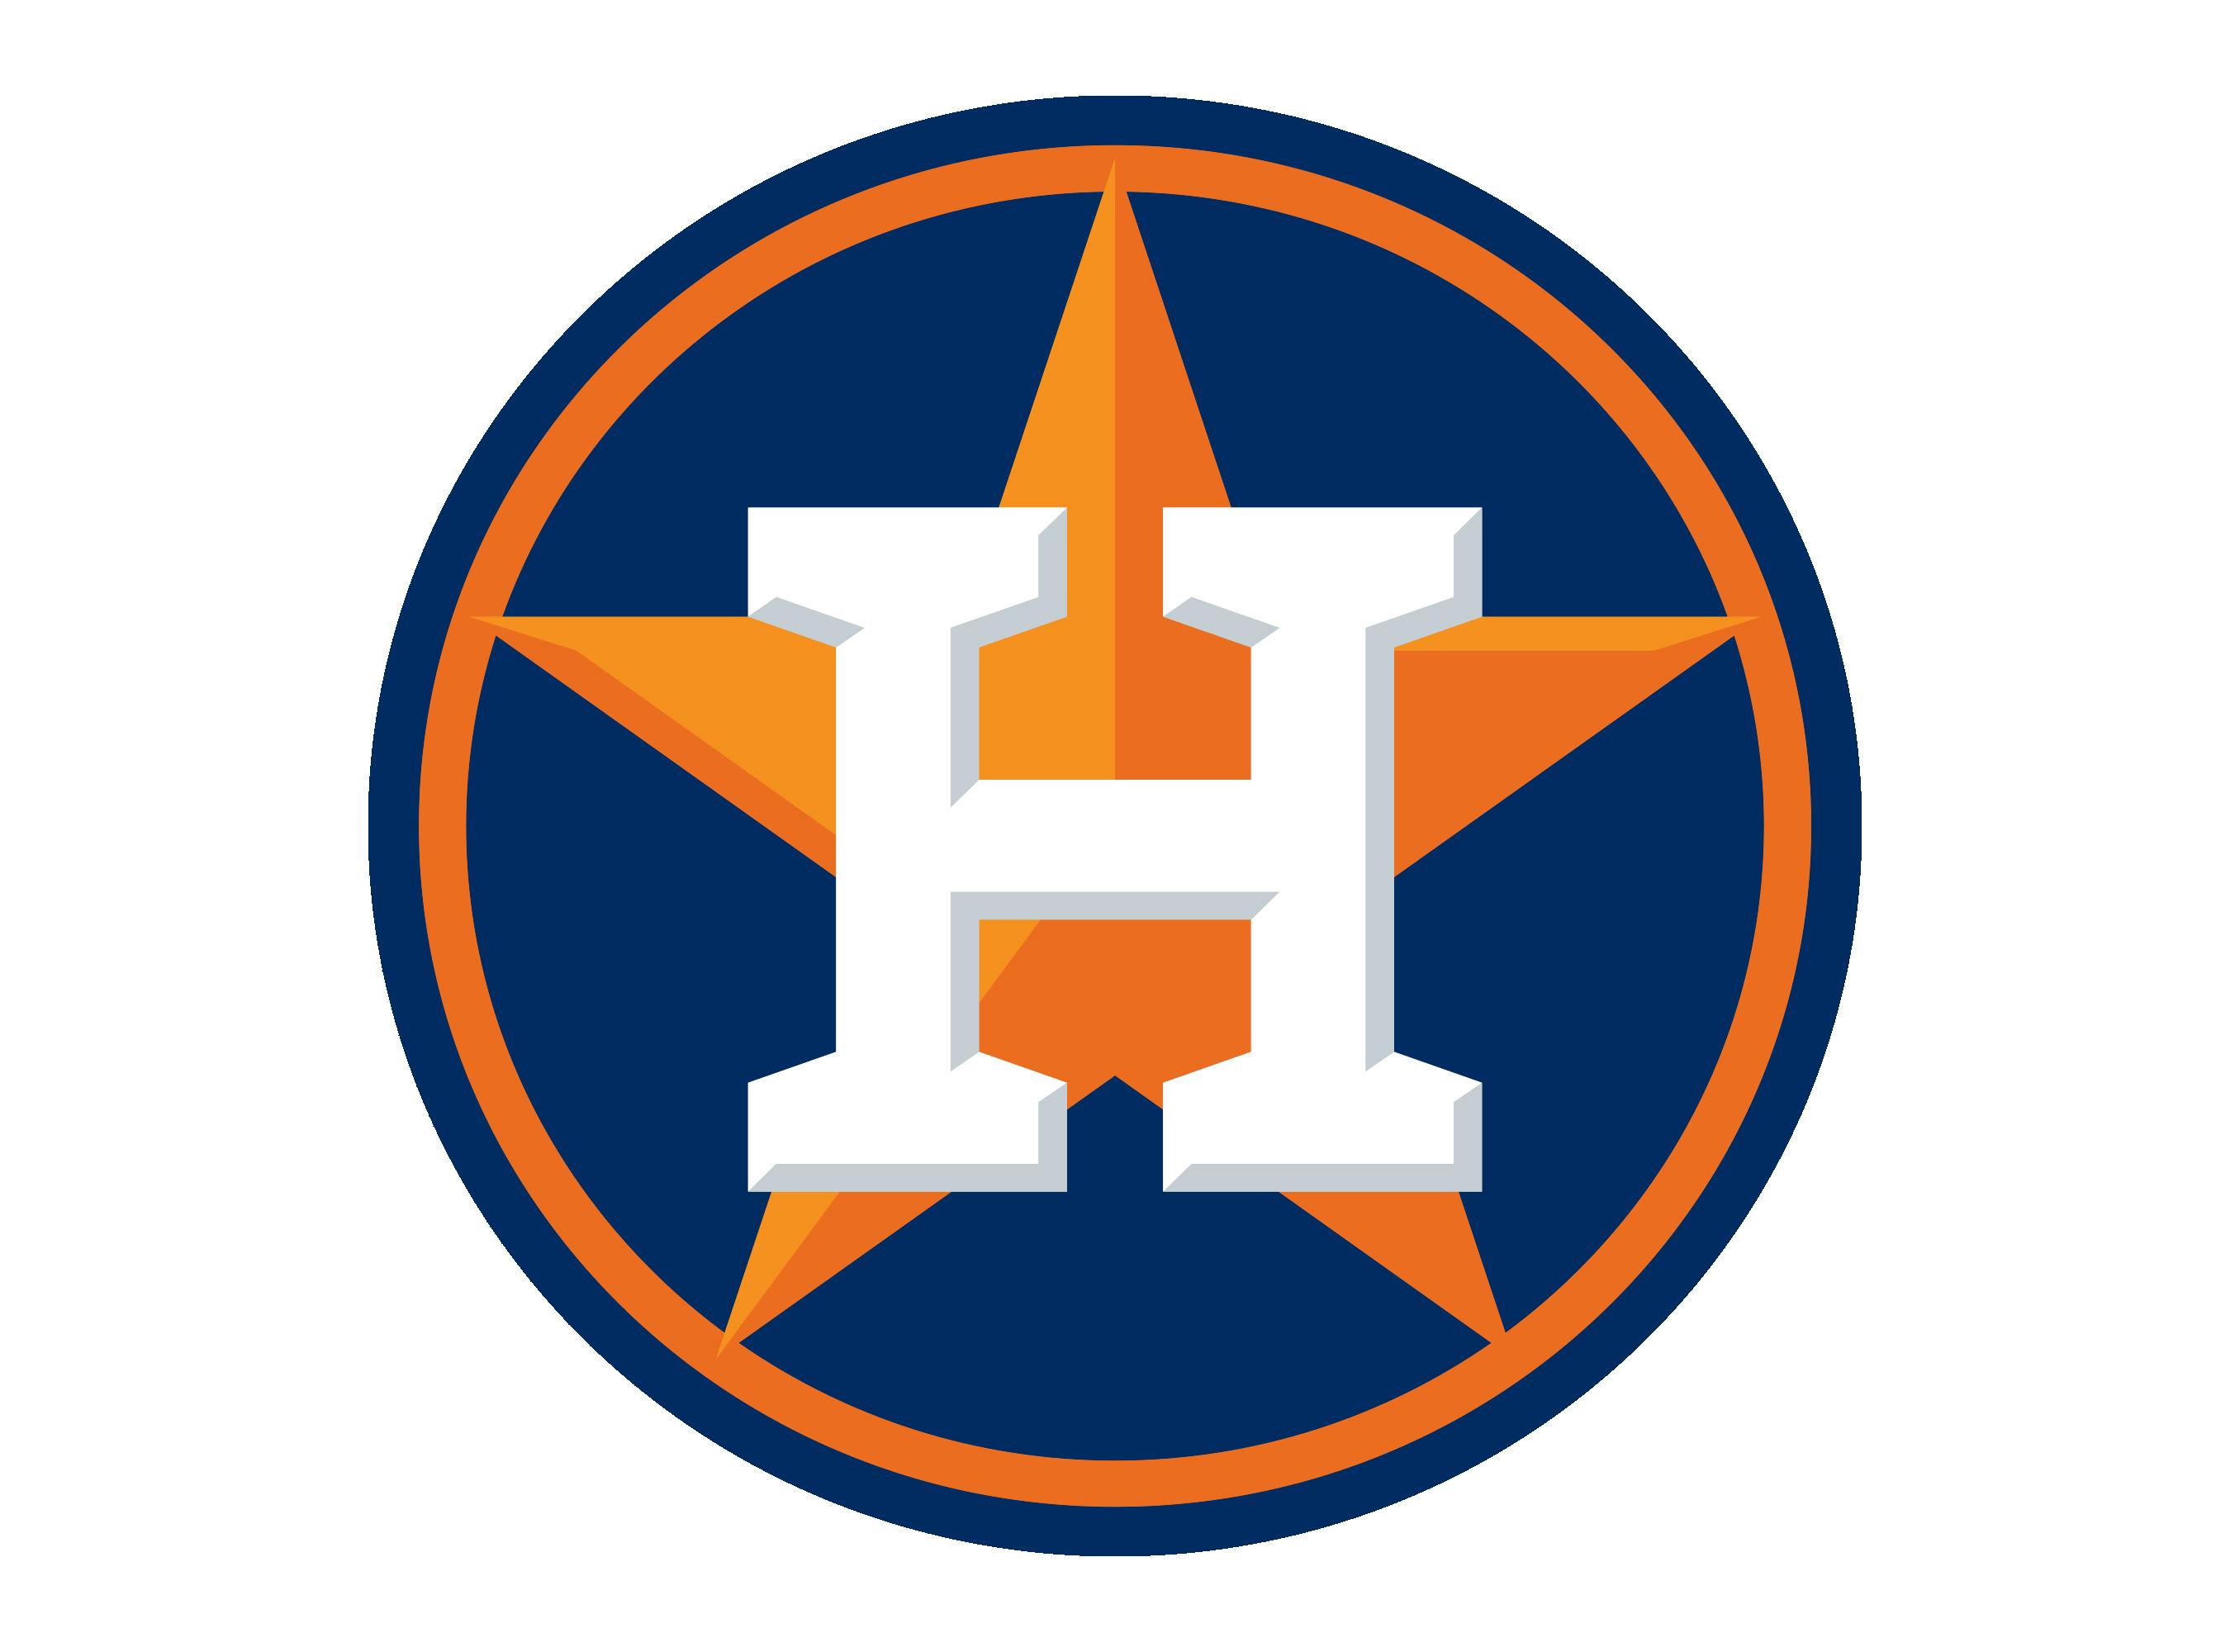 houston astros logo  astros symbol  meaning  history and atlanta braves logo font download Atlanta Braves Baseball Logo